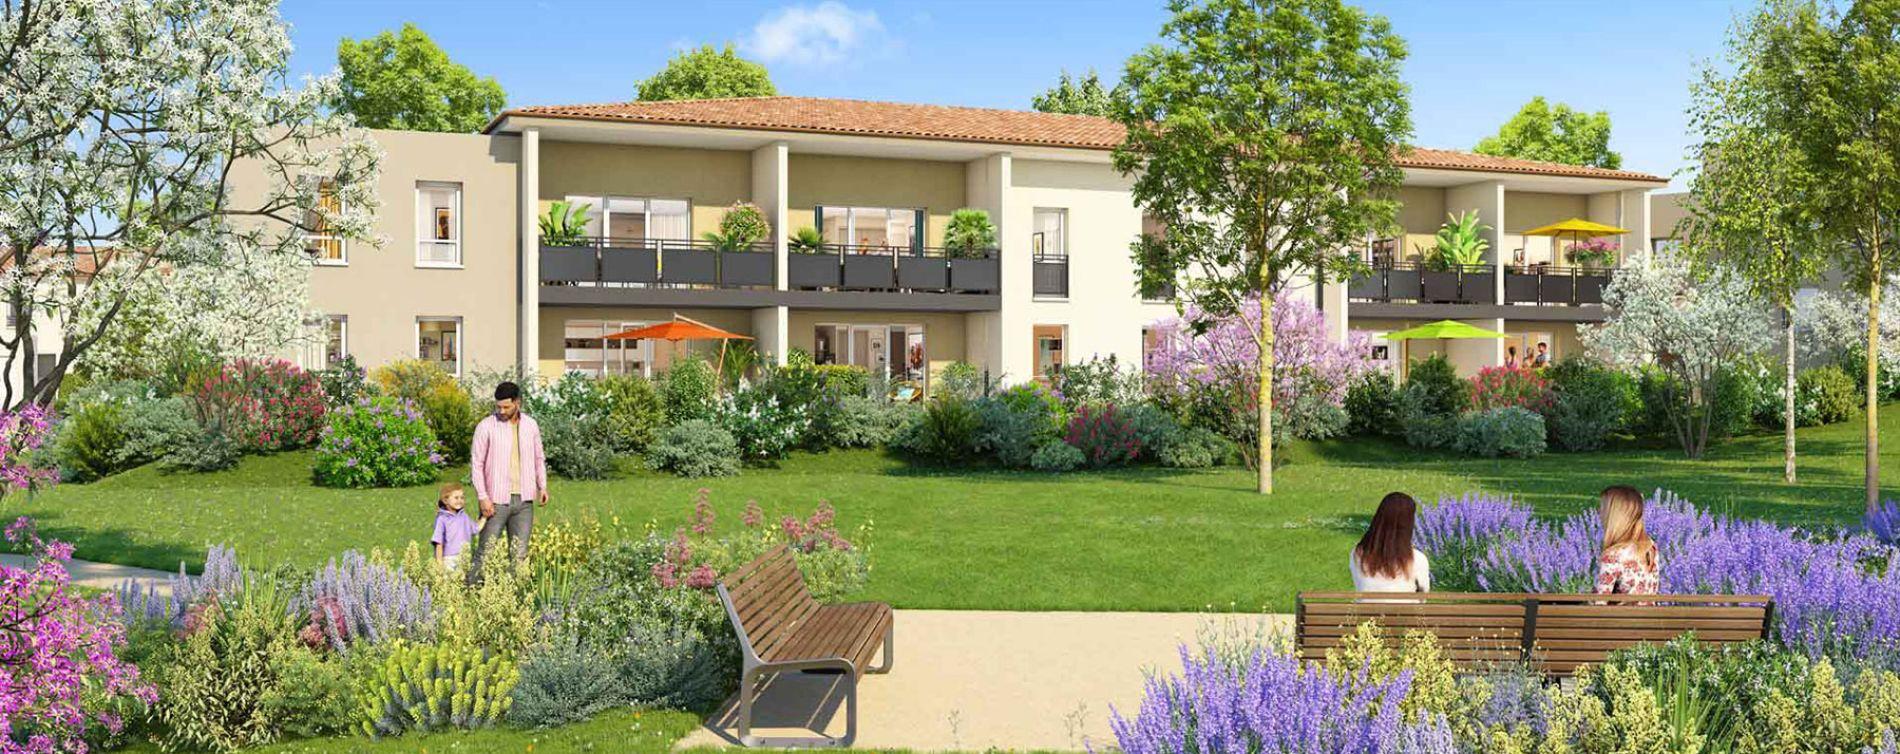 Gardanne : programme immobilier neuve « Harmonie Provence »